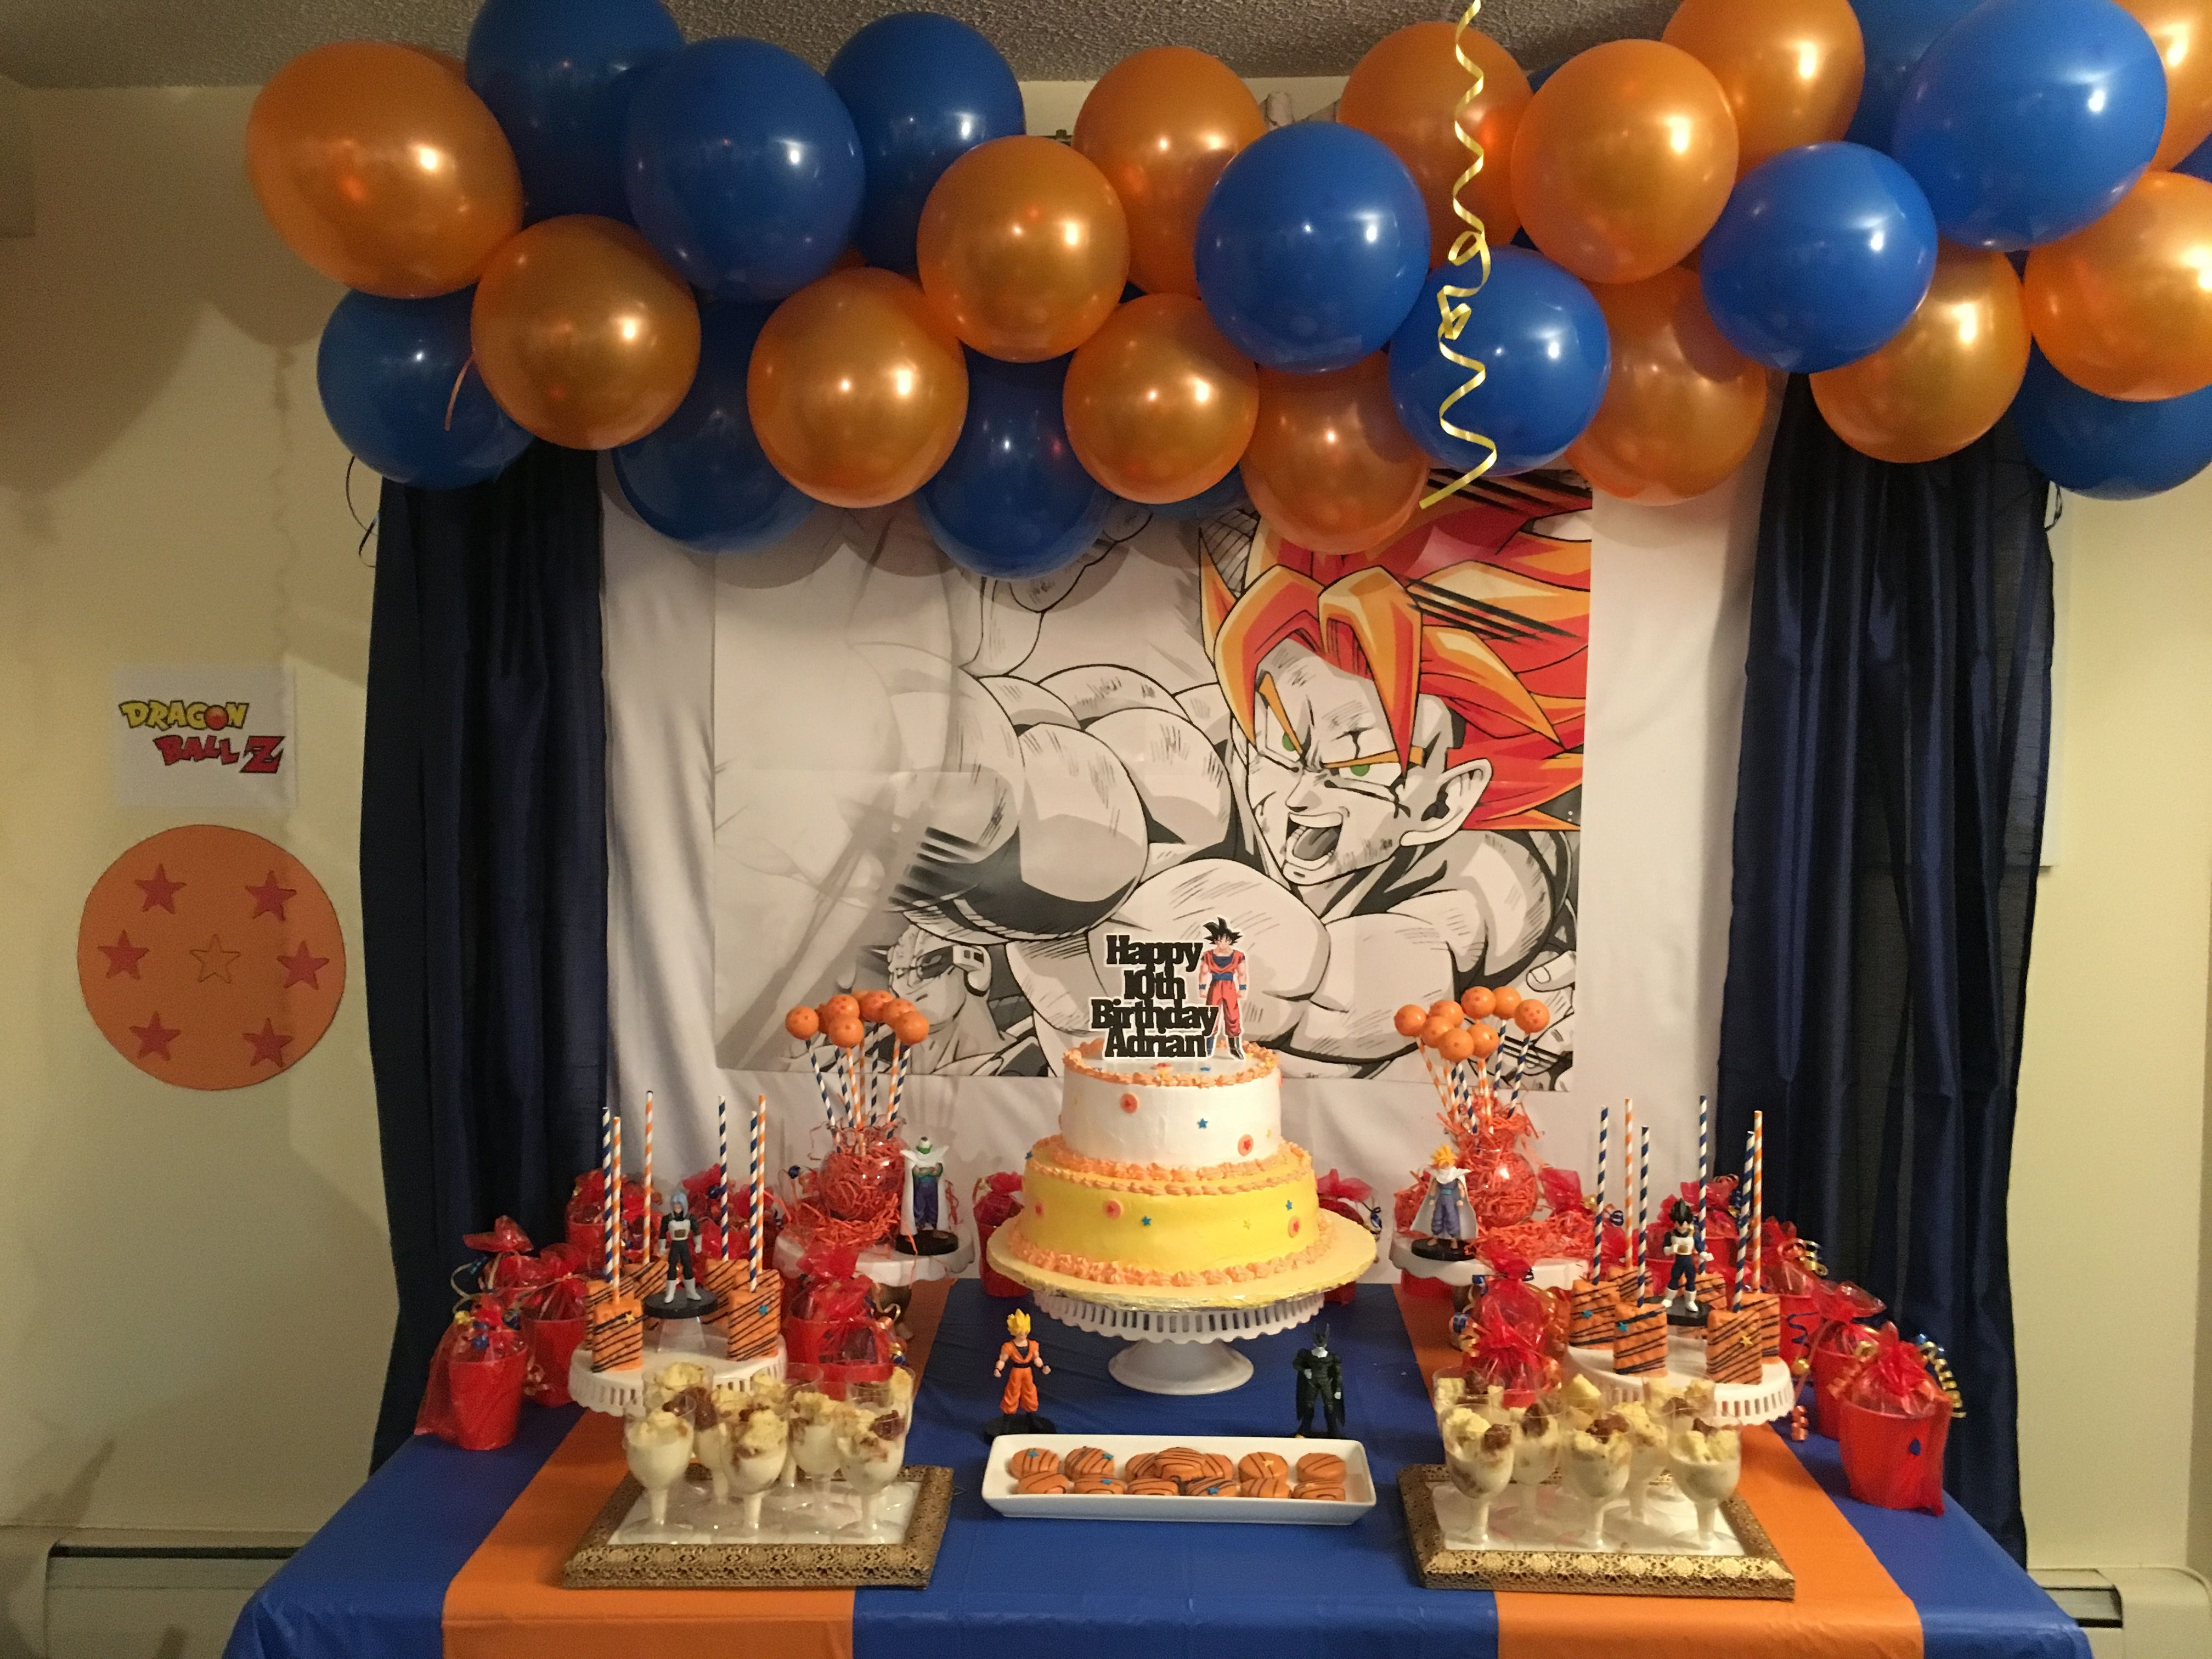 Dragon Ball Z Birthday Party Cake Smash Pictures Dragon Ball Z Birthday Party Dragon Birthday